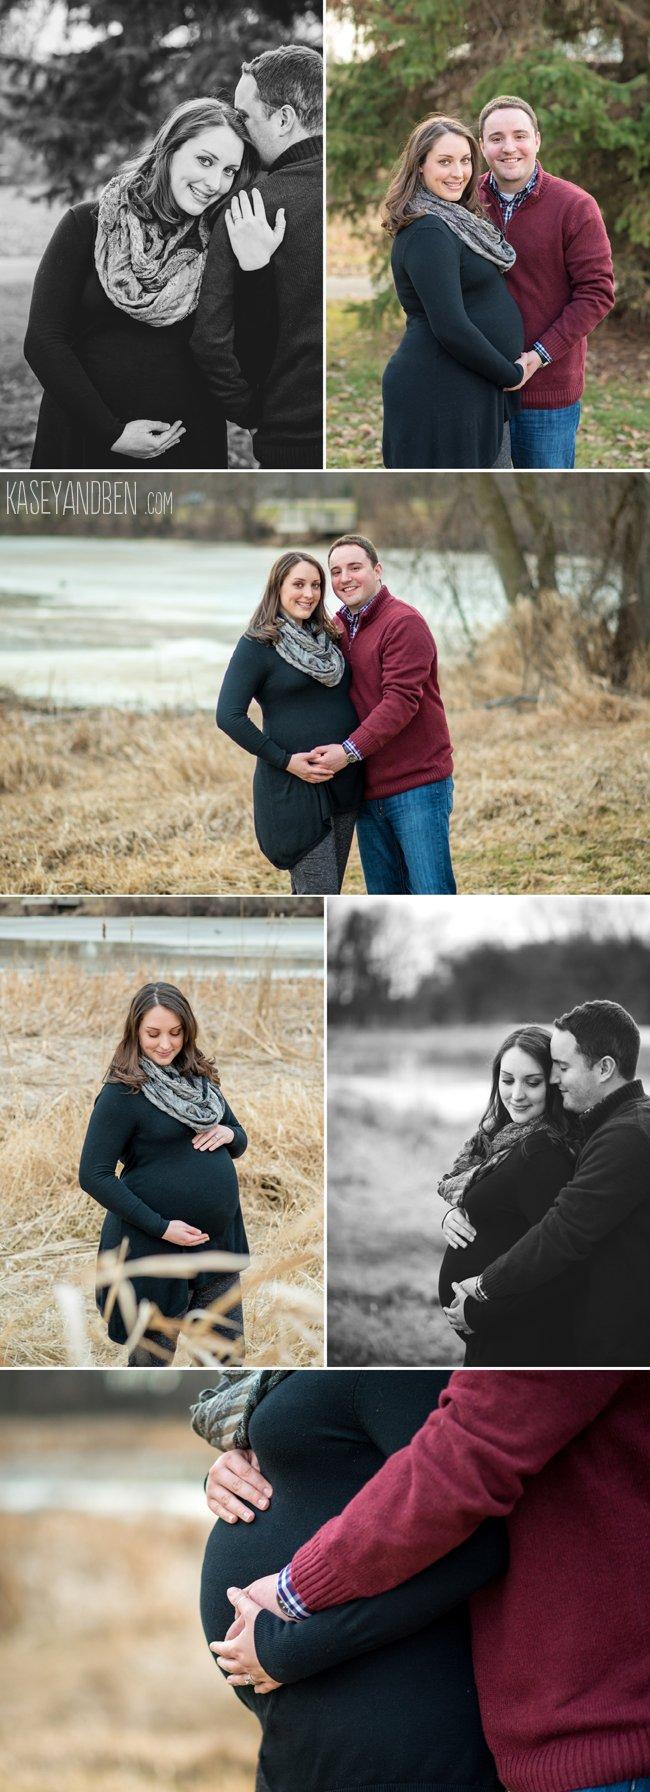 Maternity Photos Kasey And Ben Photography